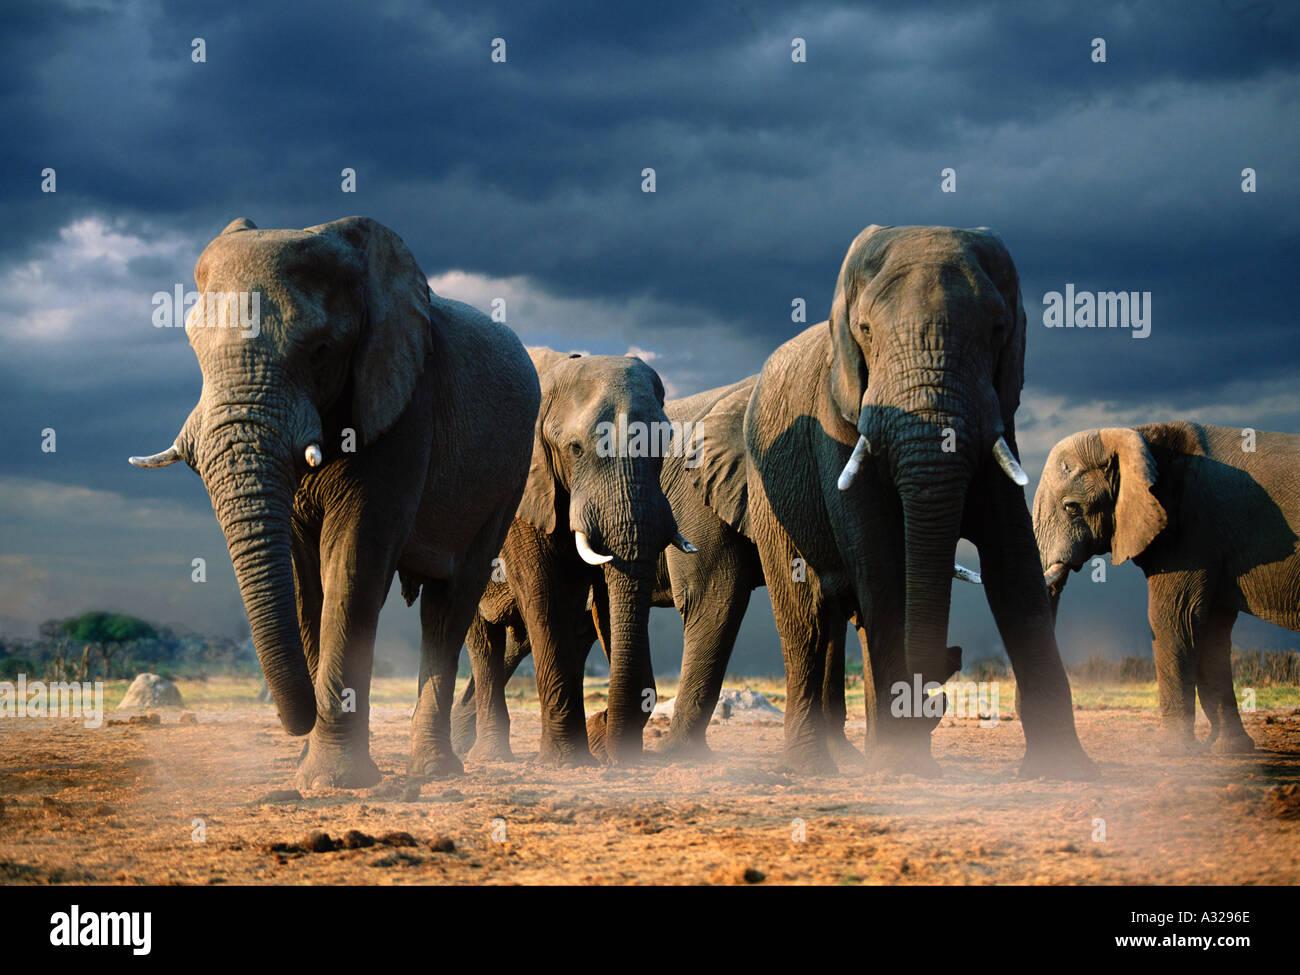 Elephants with storm clouds Botswana - Stock Image